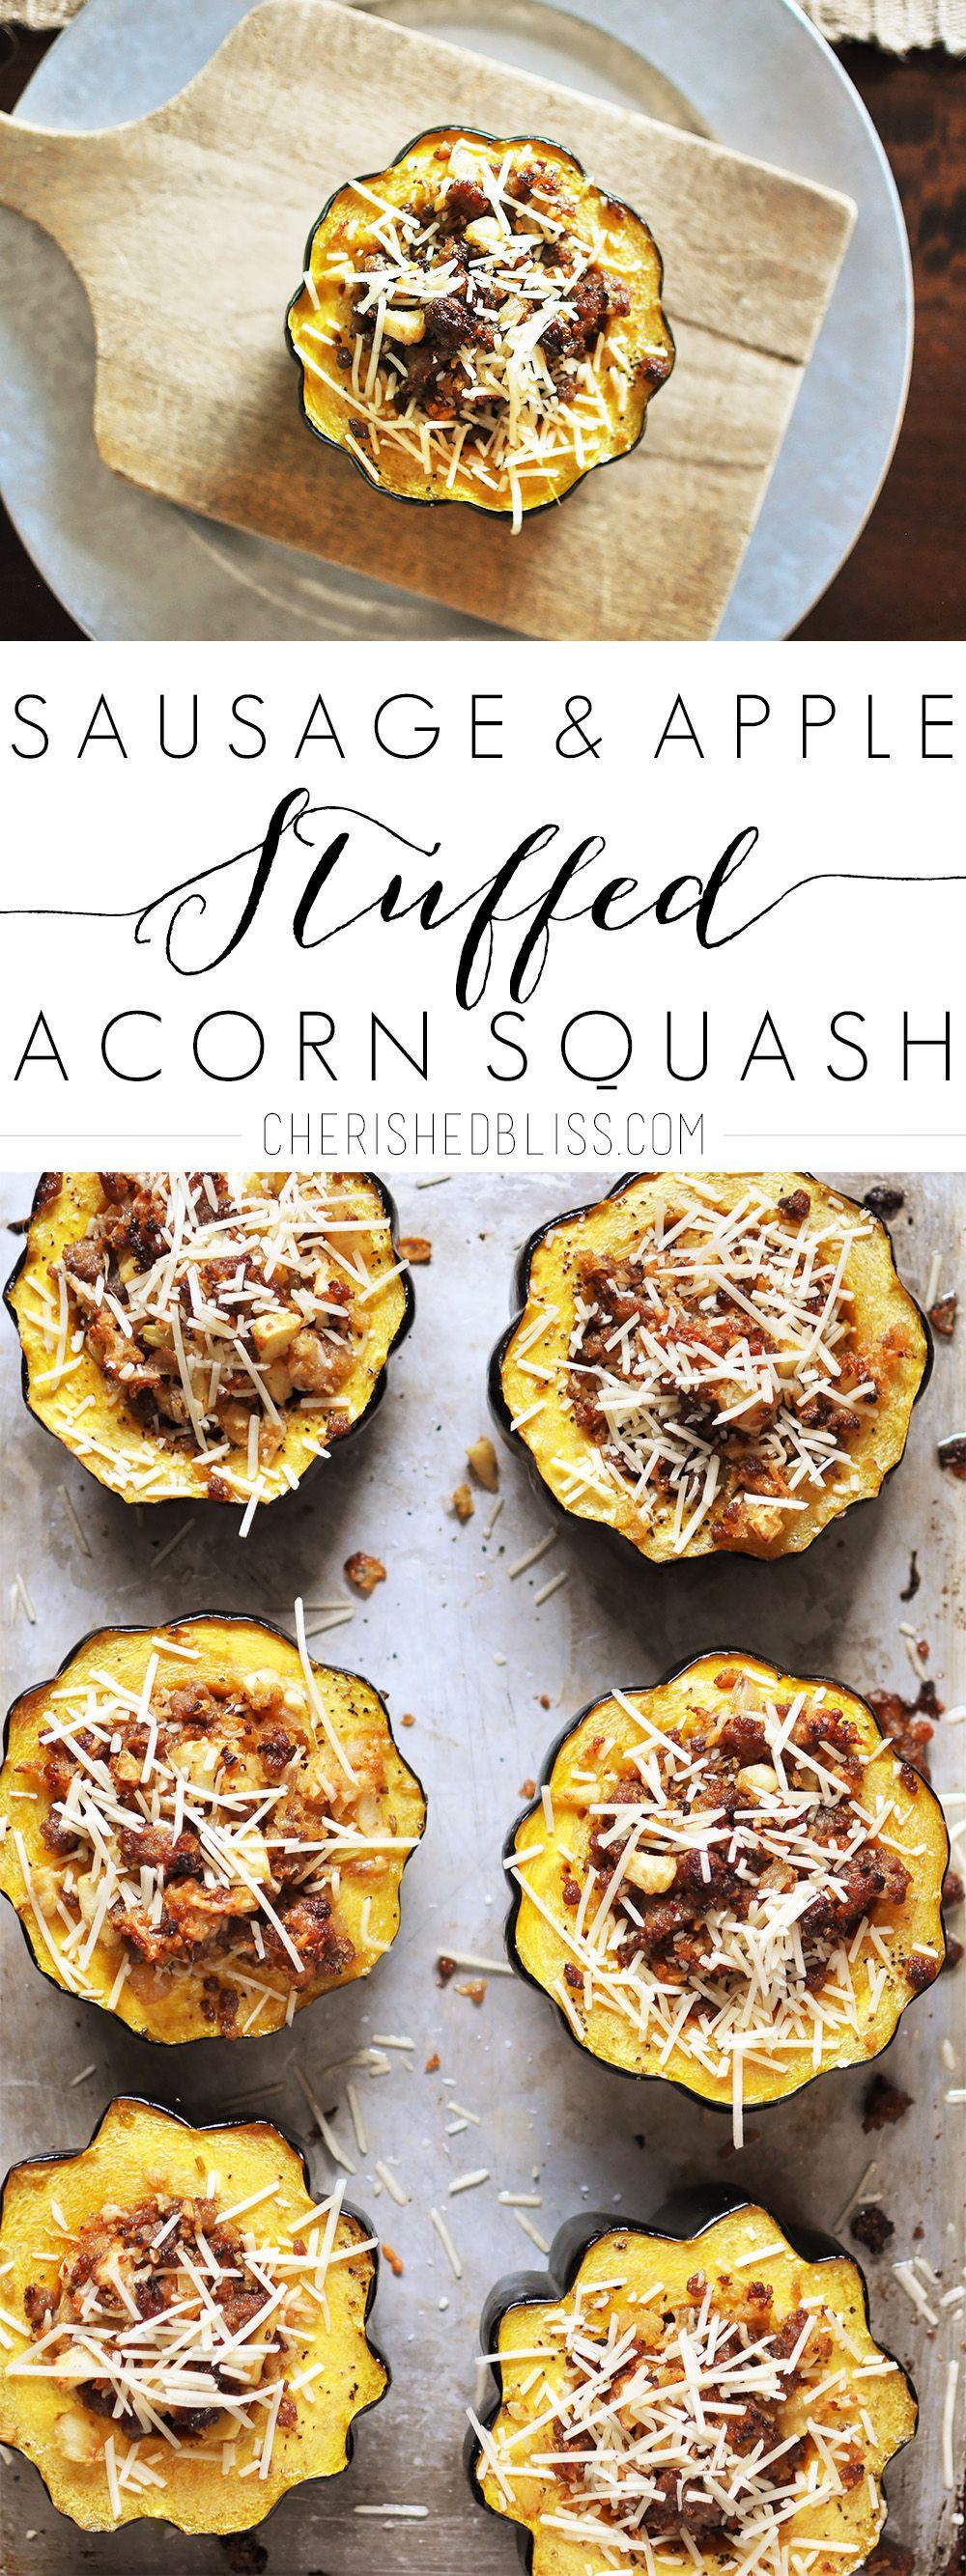 Sausage and Apple Stuffed Acorn Squash -   23 fall dinner recipes ideas